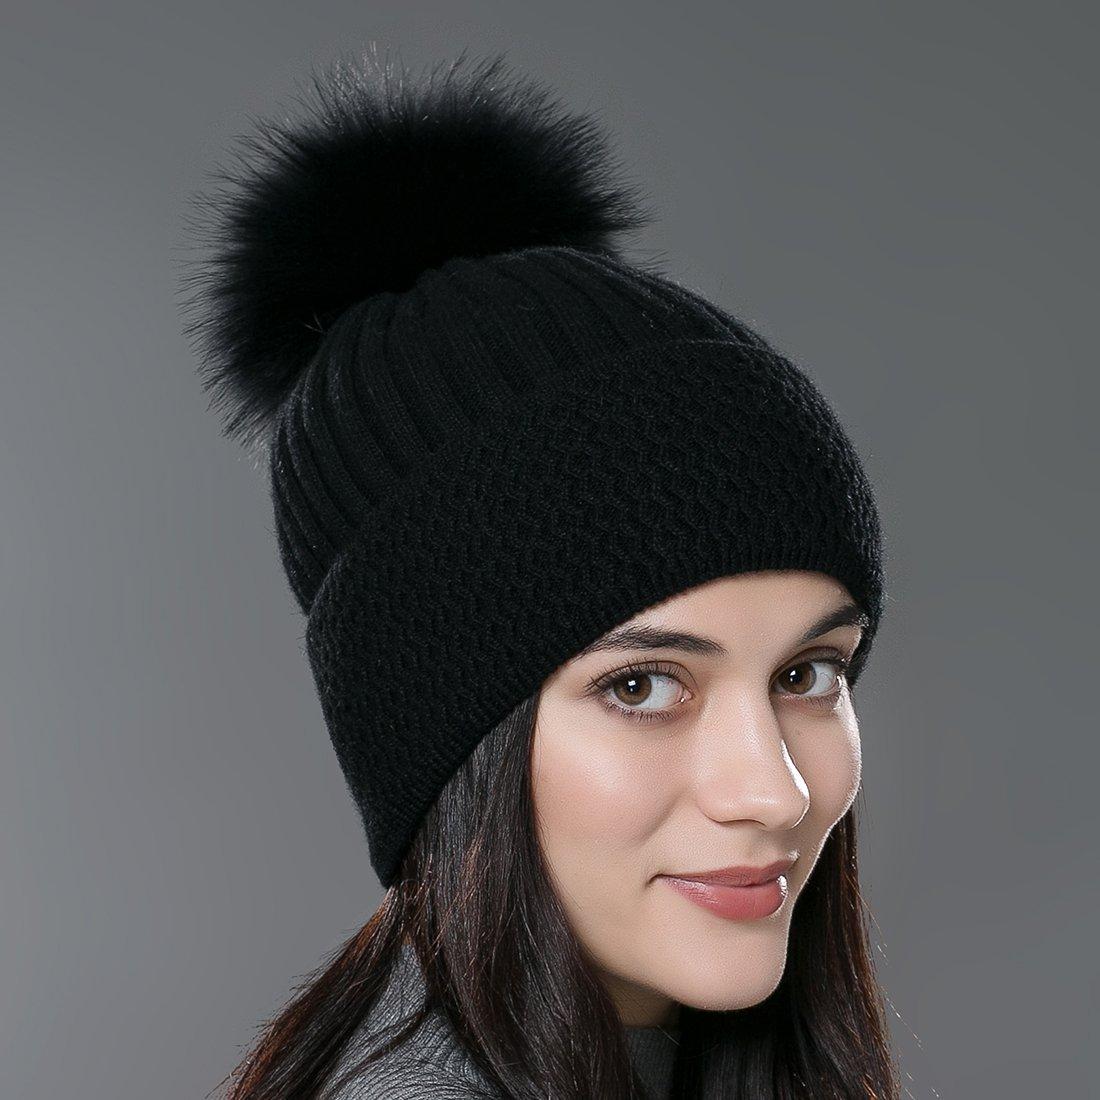 0ef9c3a8838c8 URSFUR Autumn Knit Cap with Fur Ball Pom Pom Beanie Unisex Winter Hat CA-YQ  larger image